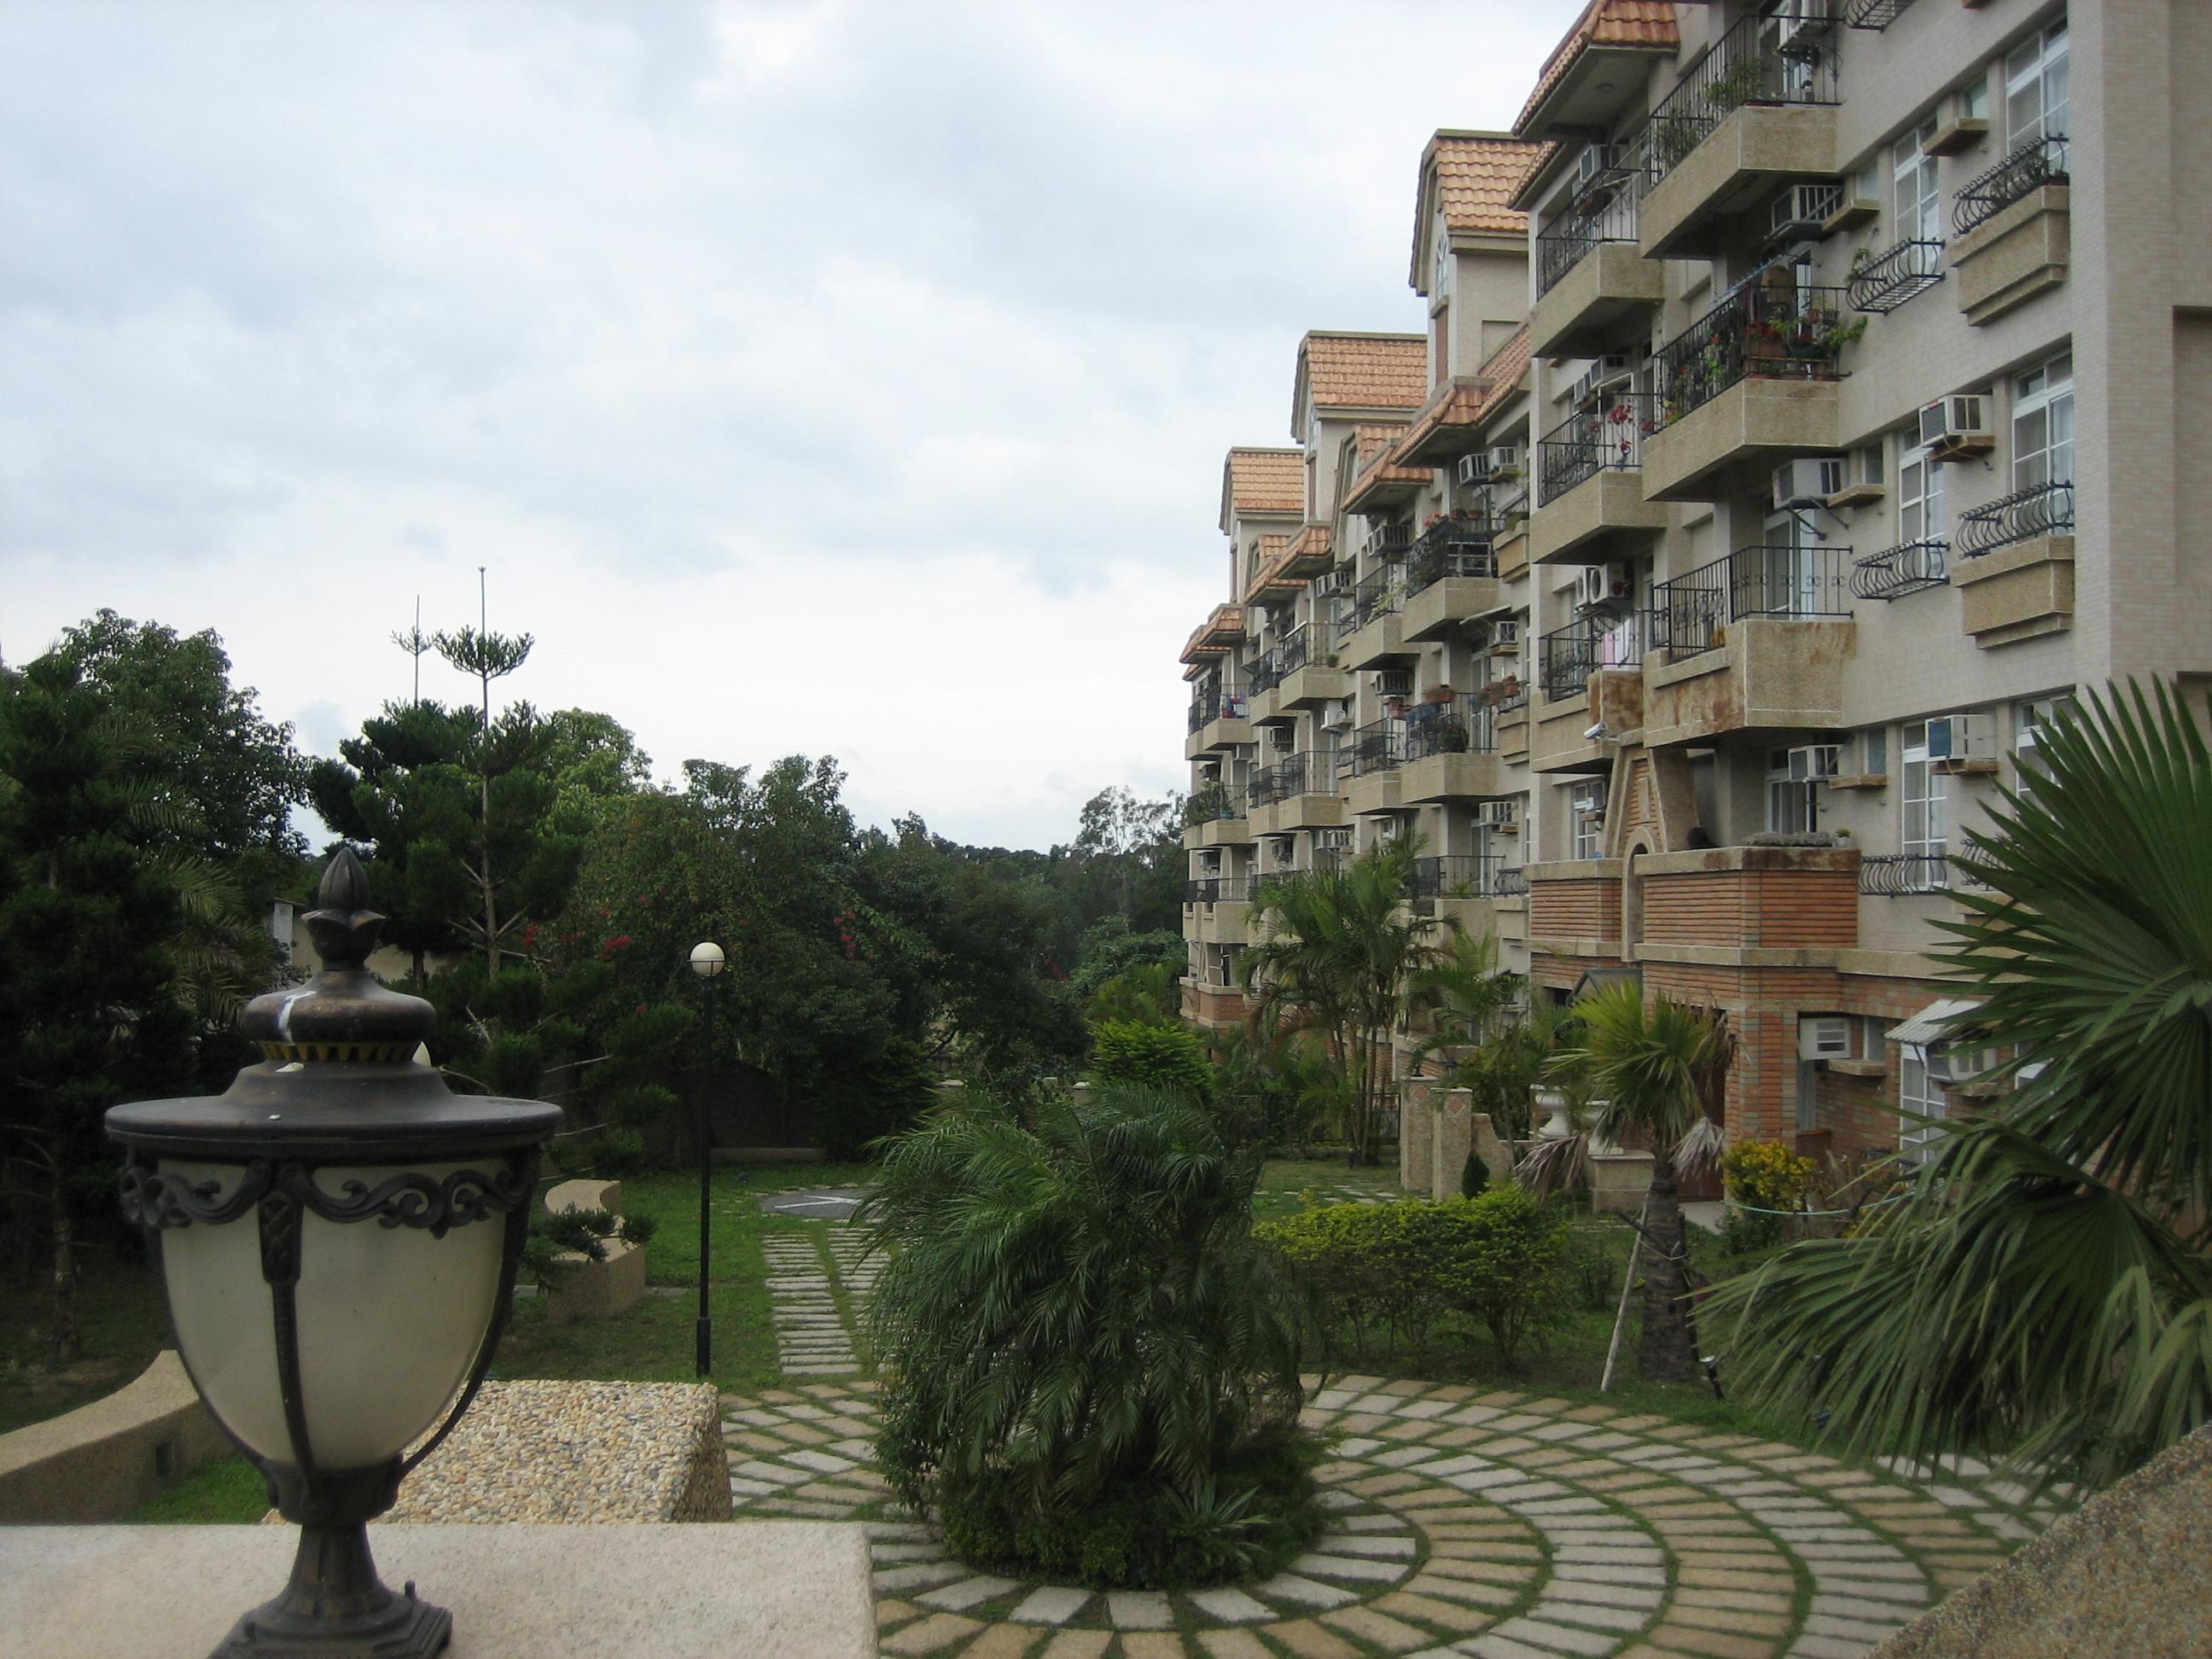 Residences in Hsinchu